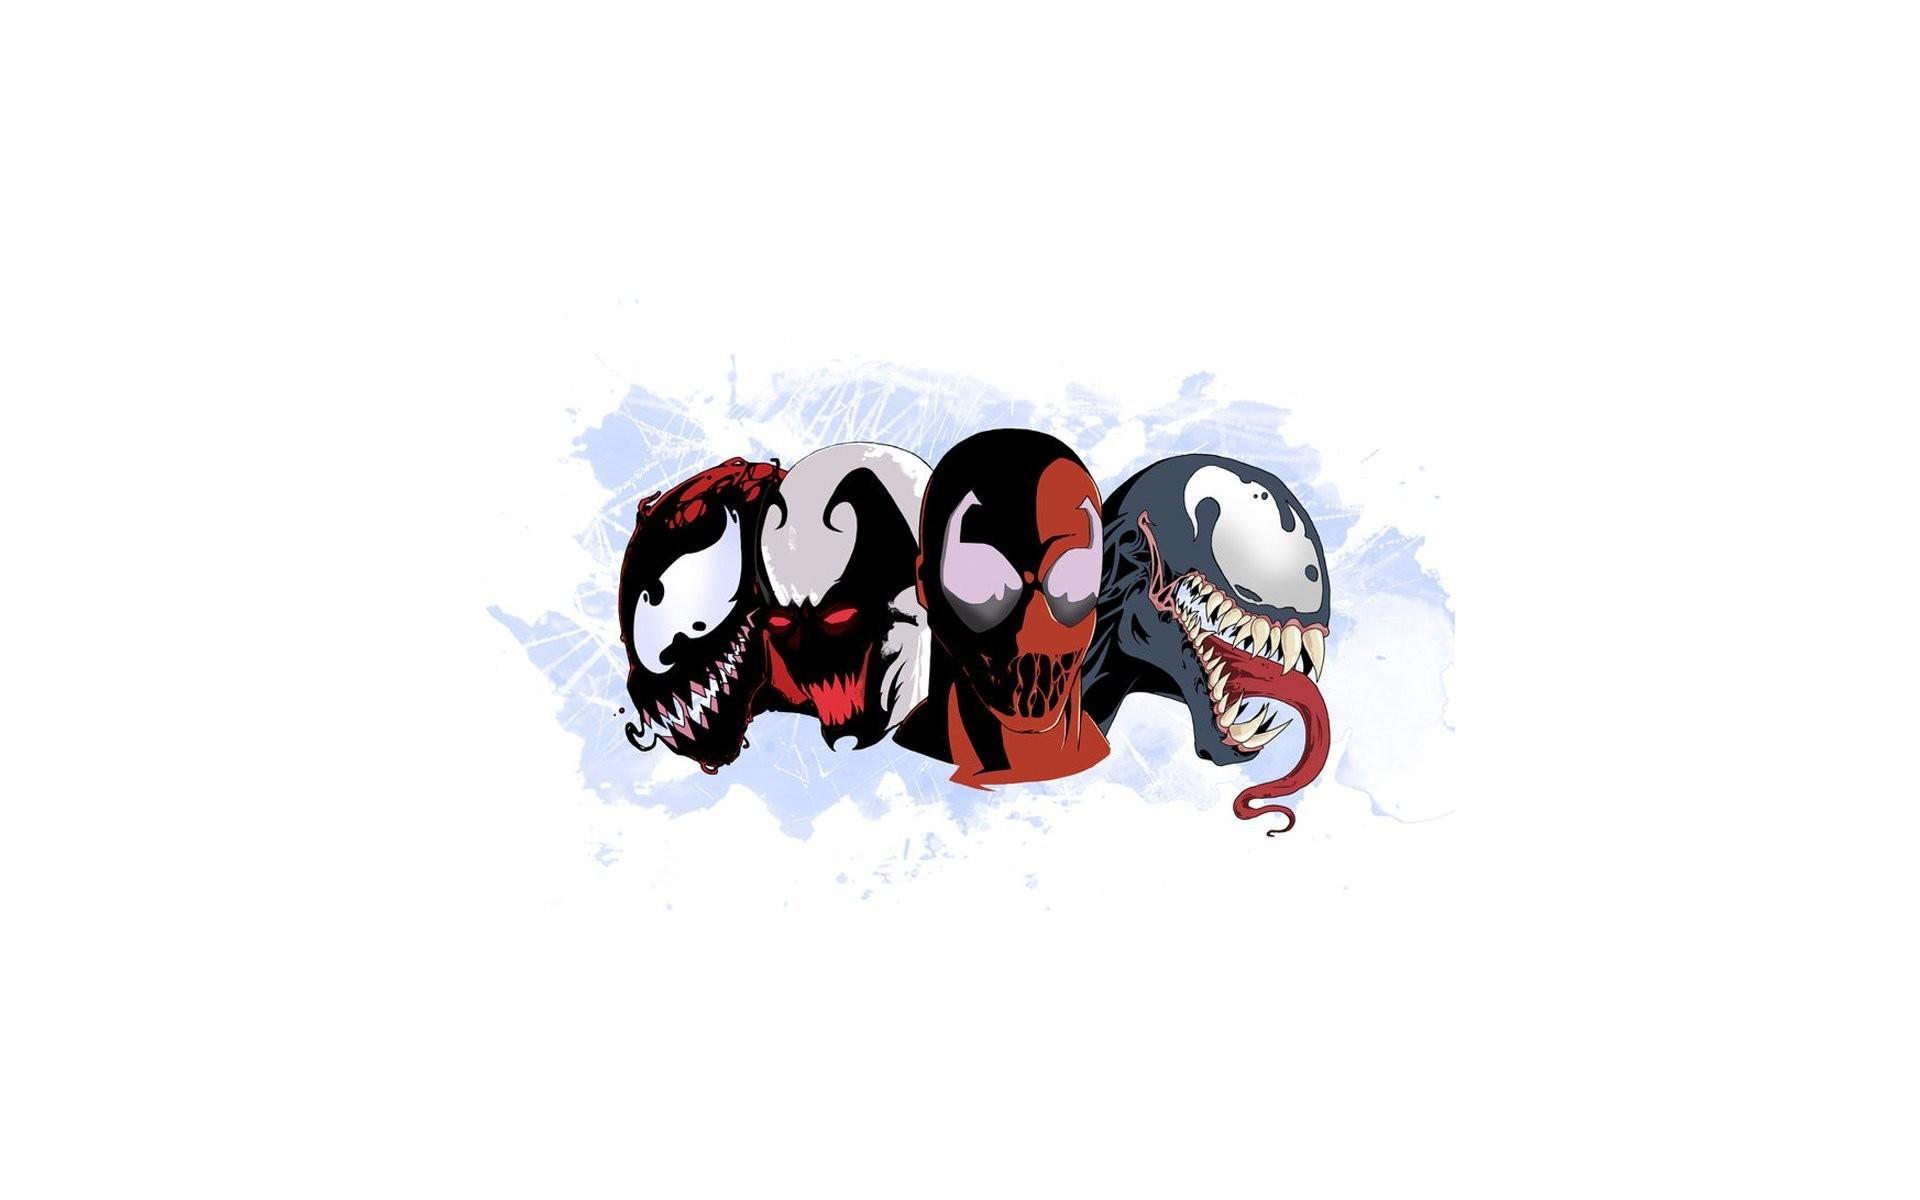 venom venom marvel symbiote symbiotes toxin toxin carnage carnage